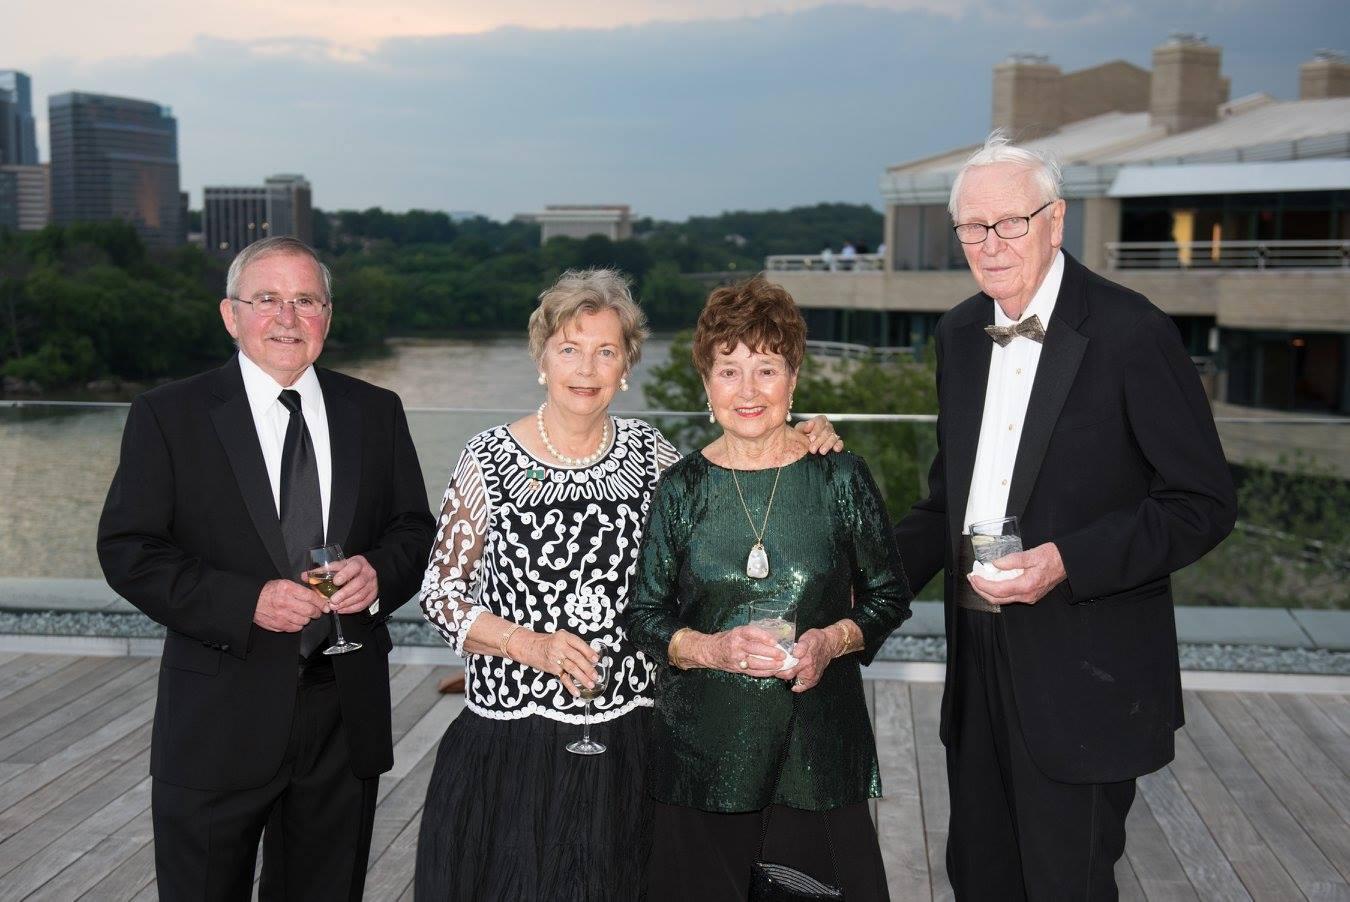 Mr. Péter Kurz, Mrs. Edith K. Lauer, Mrs. Jeanette Brown, Mr. Glenn Brown